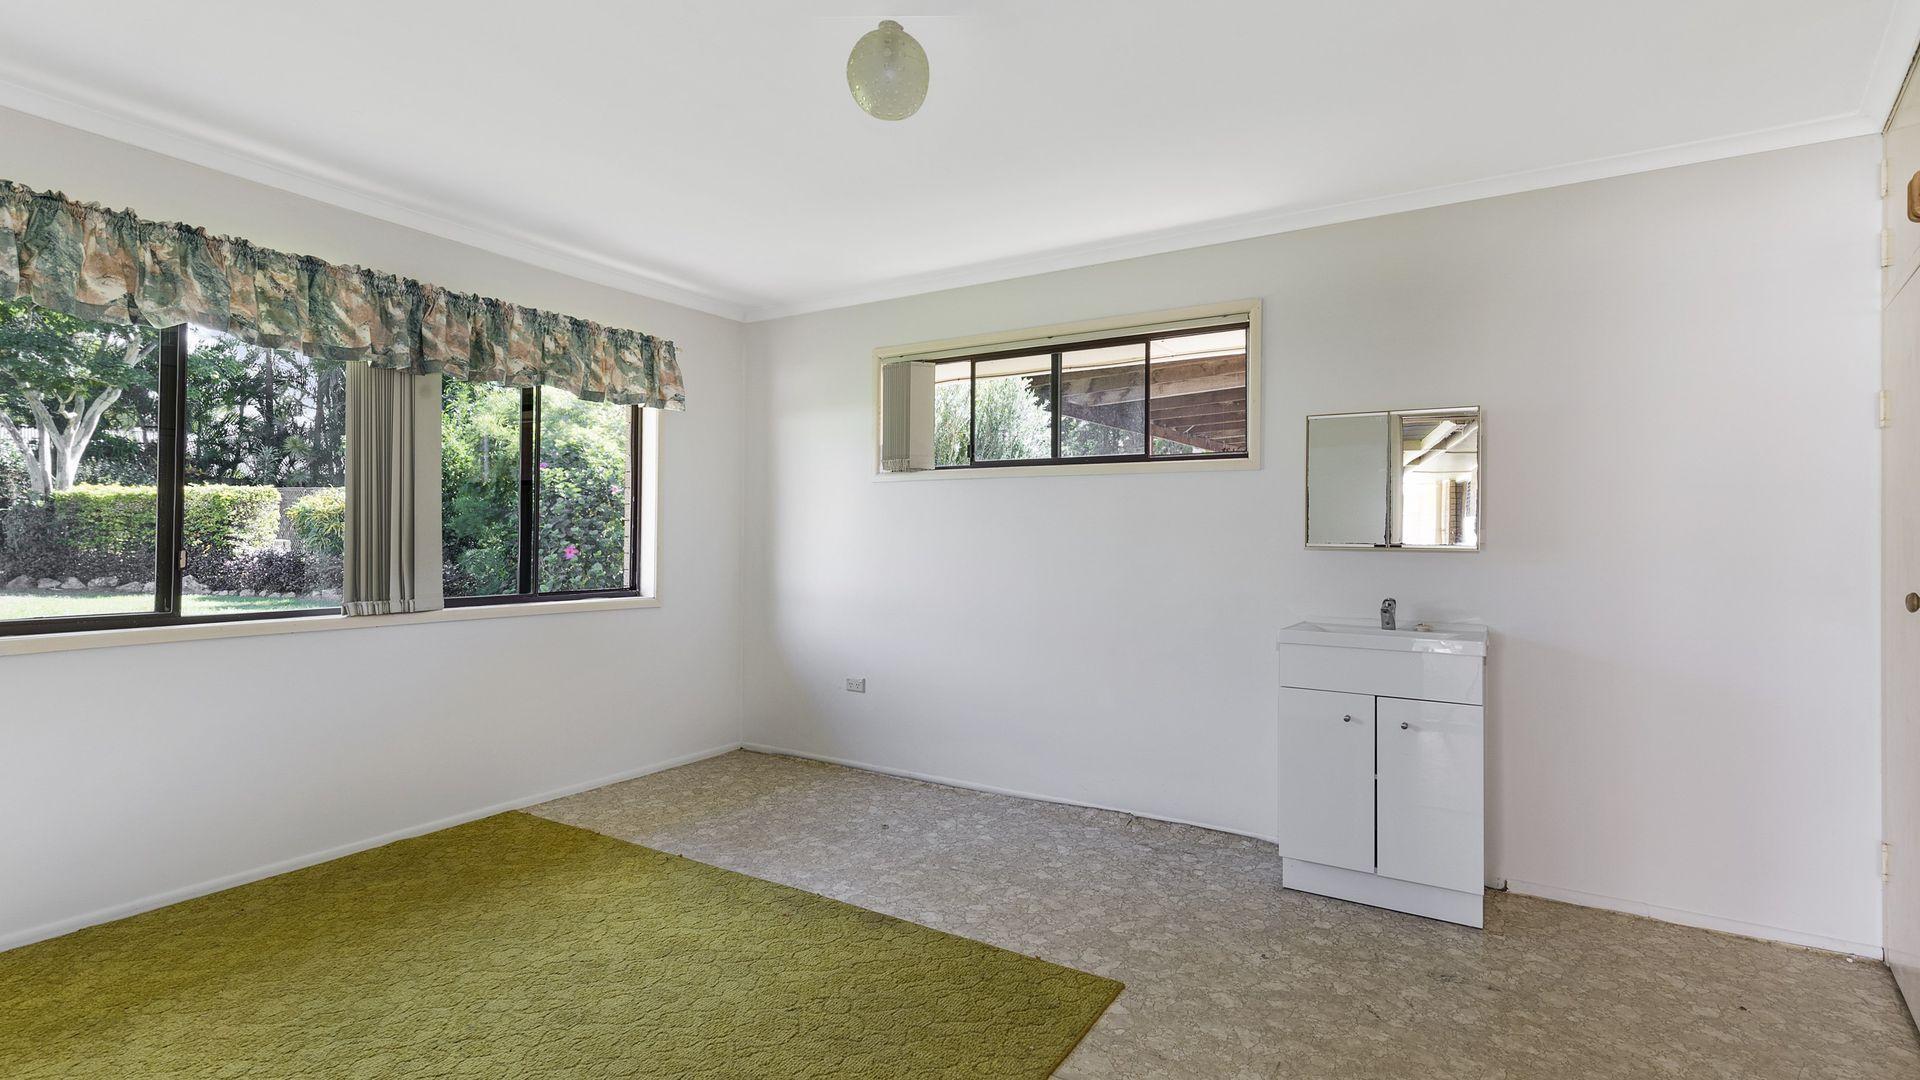 12 Valantine Road, Birkdale QLD 4159, Image 1